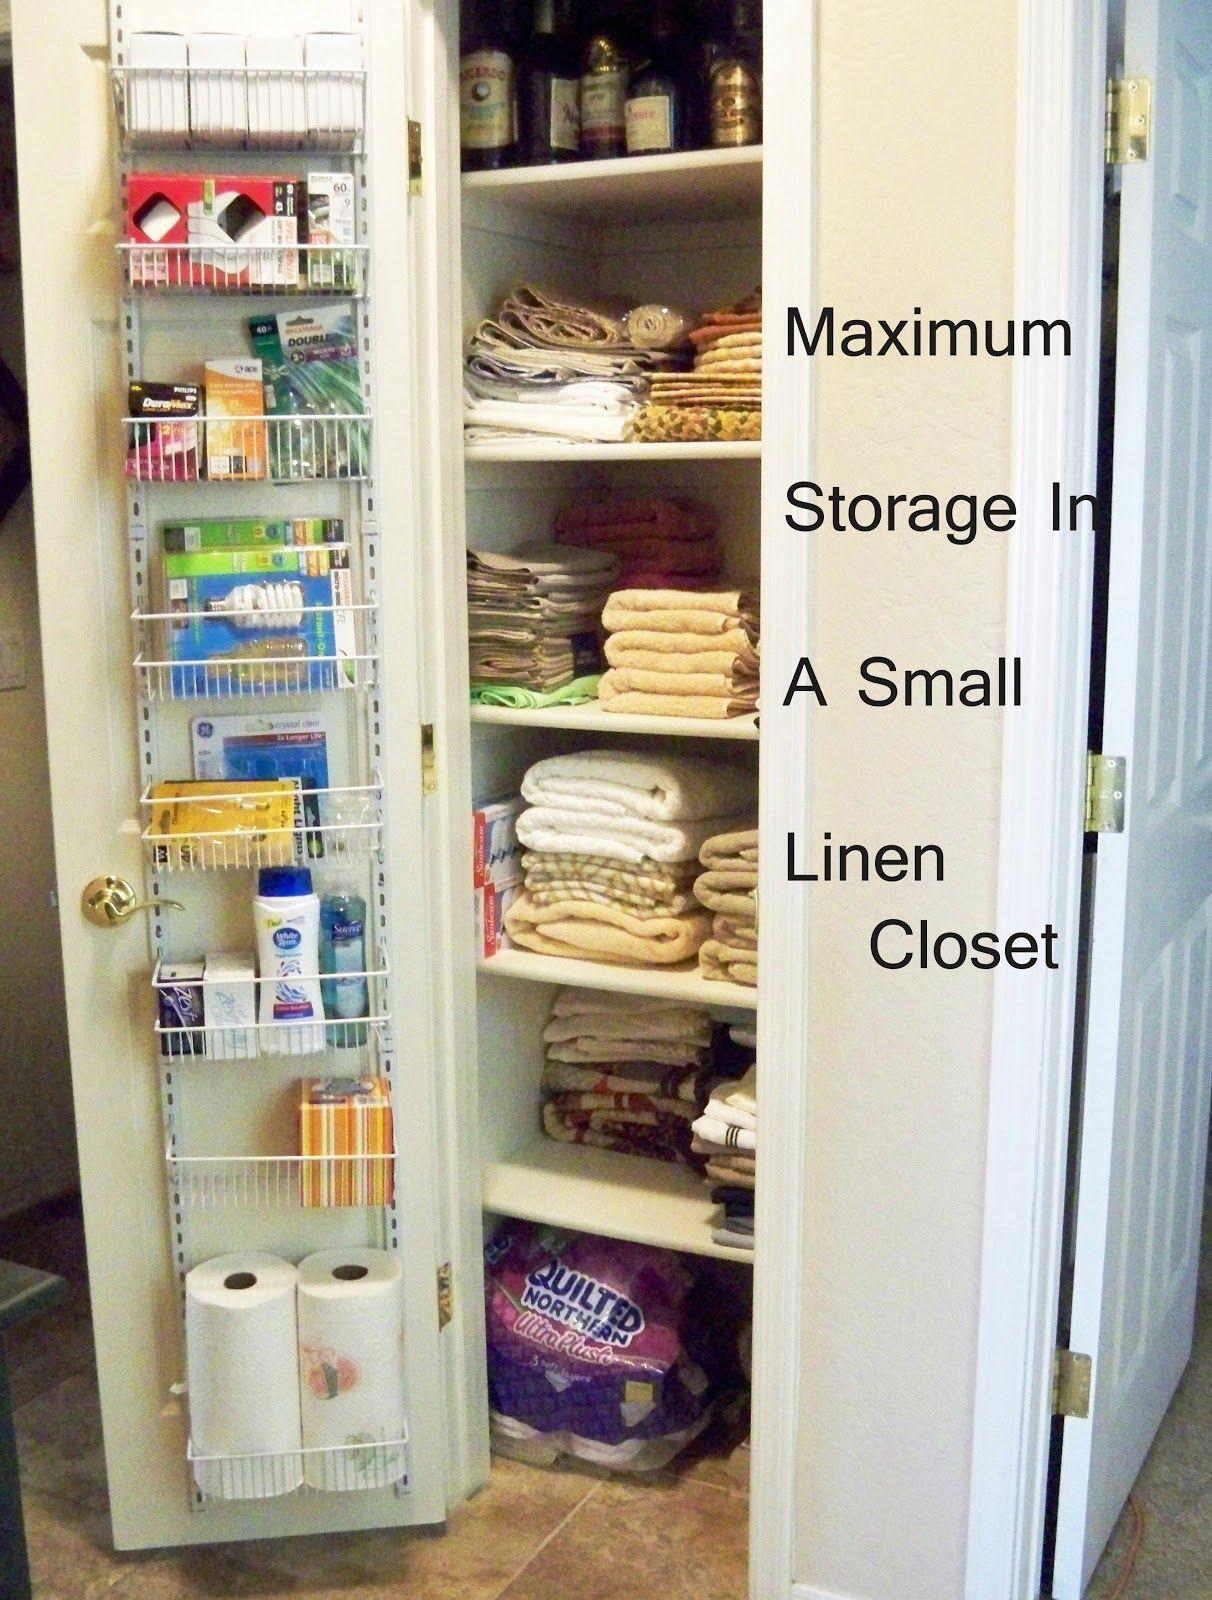 Superior Small Linen Closet Organization Ideas Part - 3: A Stroll Thru Life: Maximum Storage In A Small Linen Closet